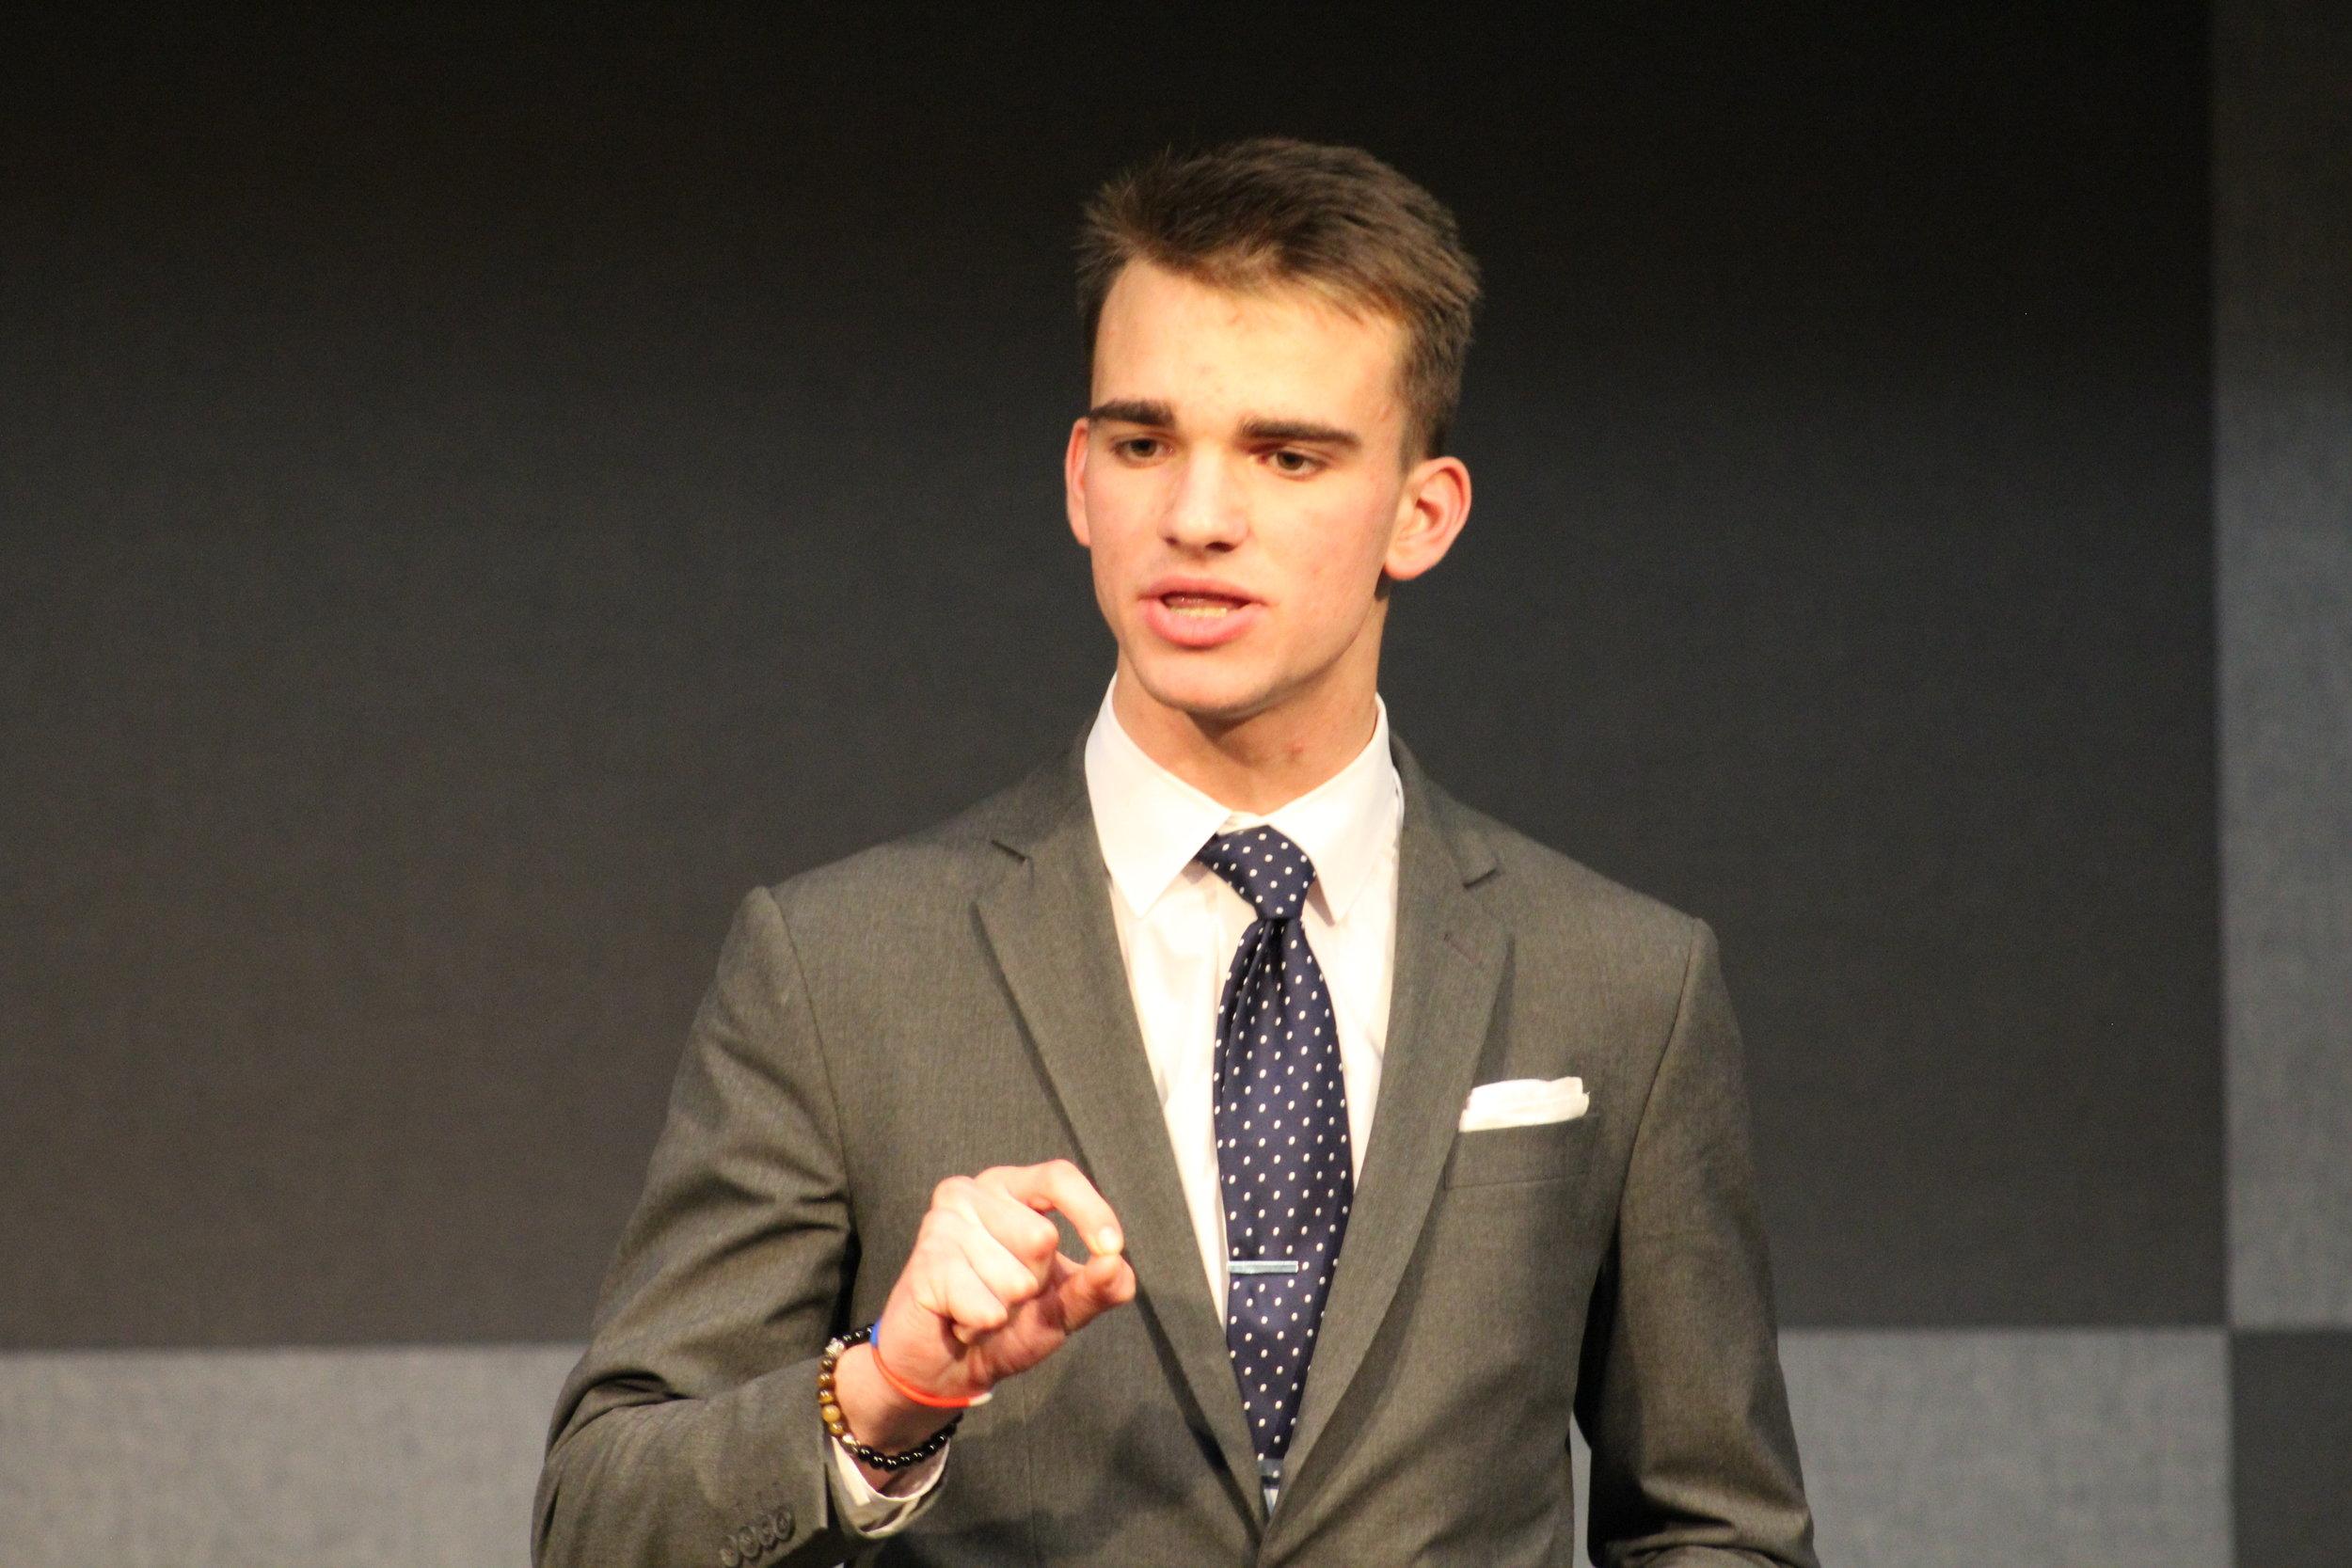 Drew speaking during a high-powered prelim round.